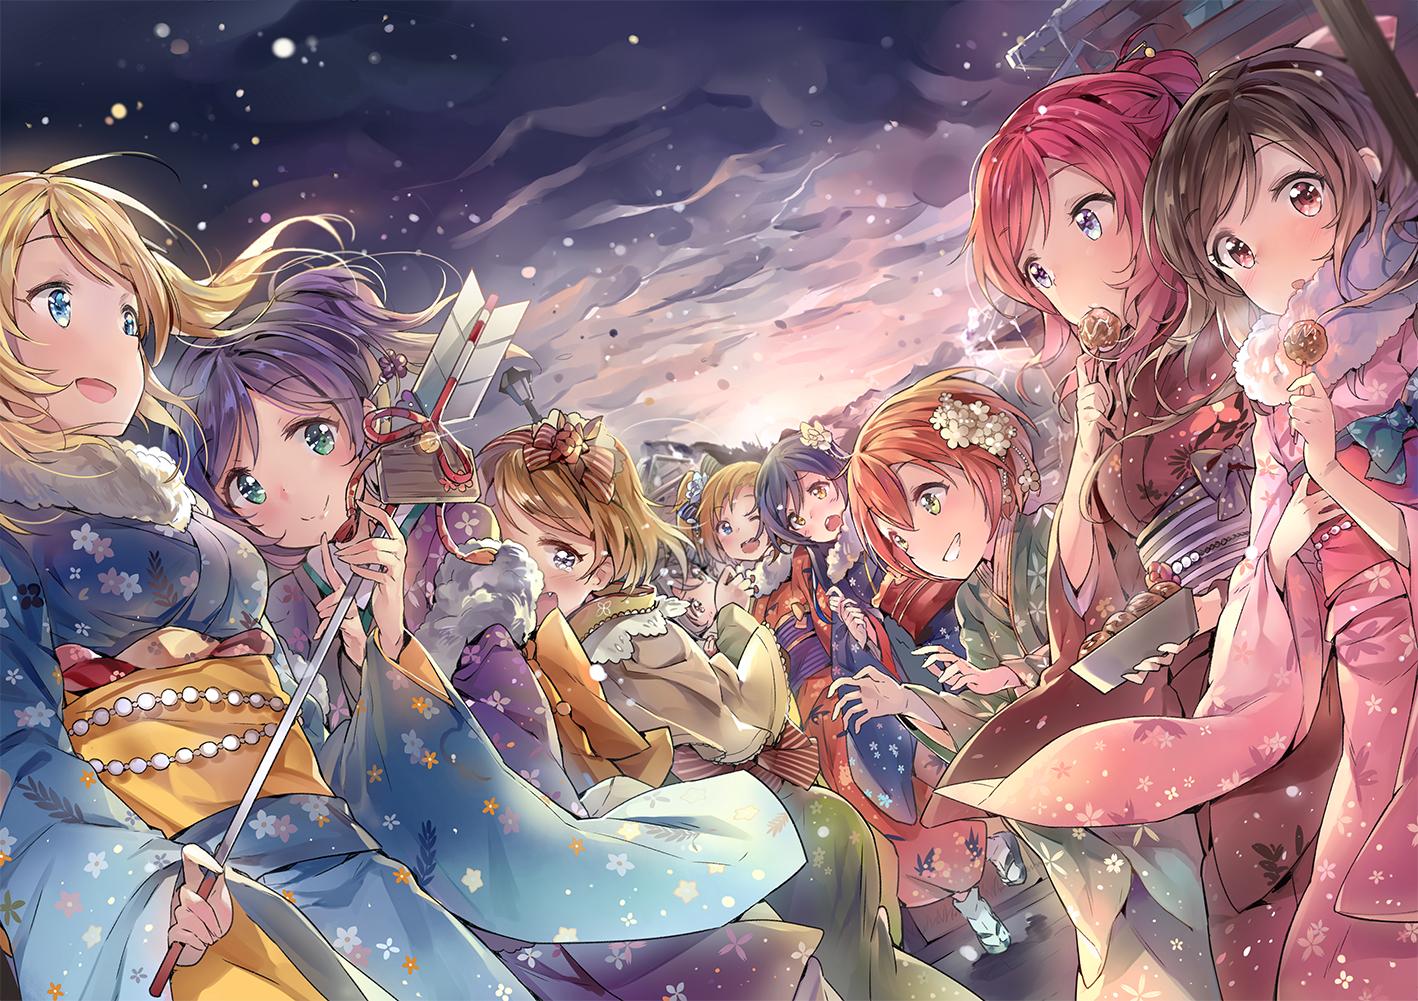 Hoshizora rin fanart zerochan anime image board - Love live wallpaper 540x960 ...